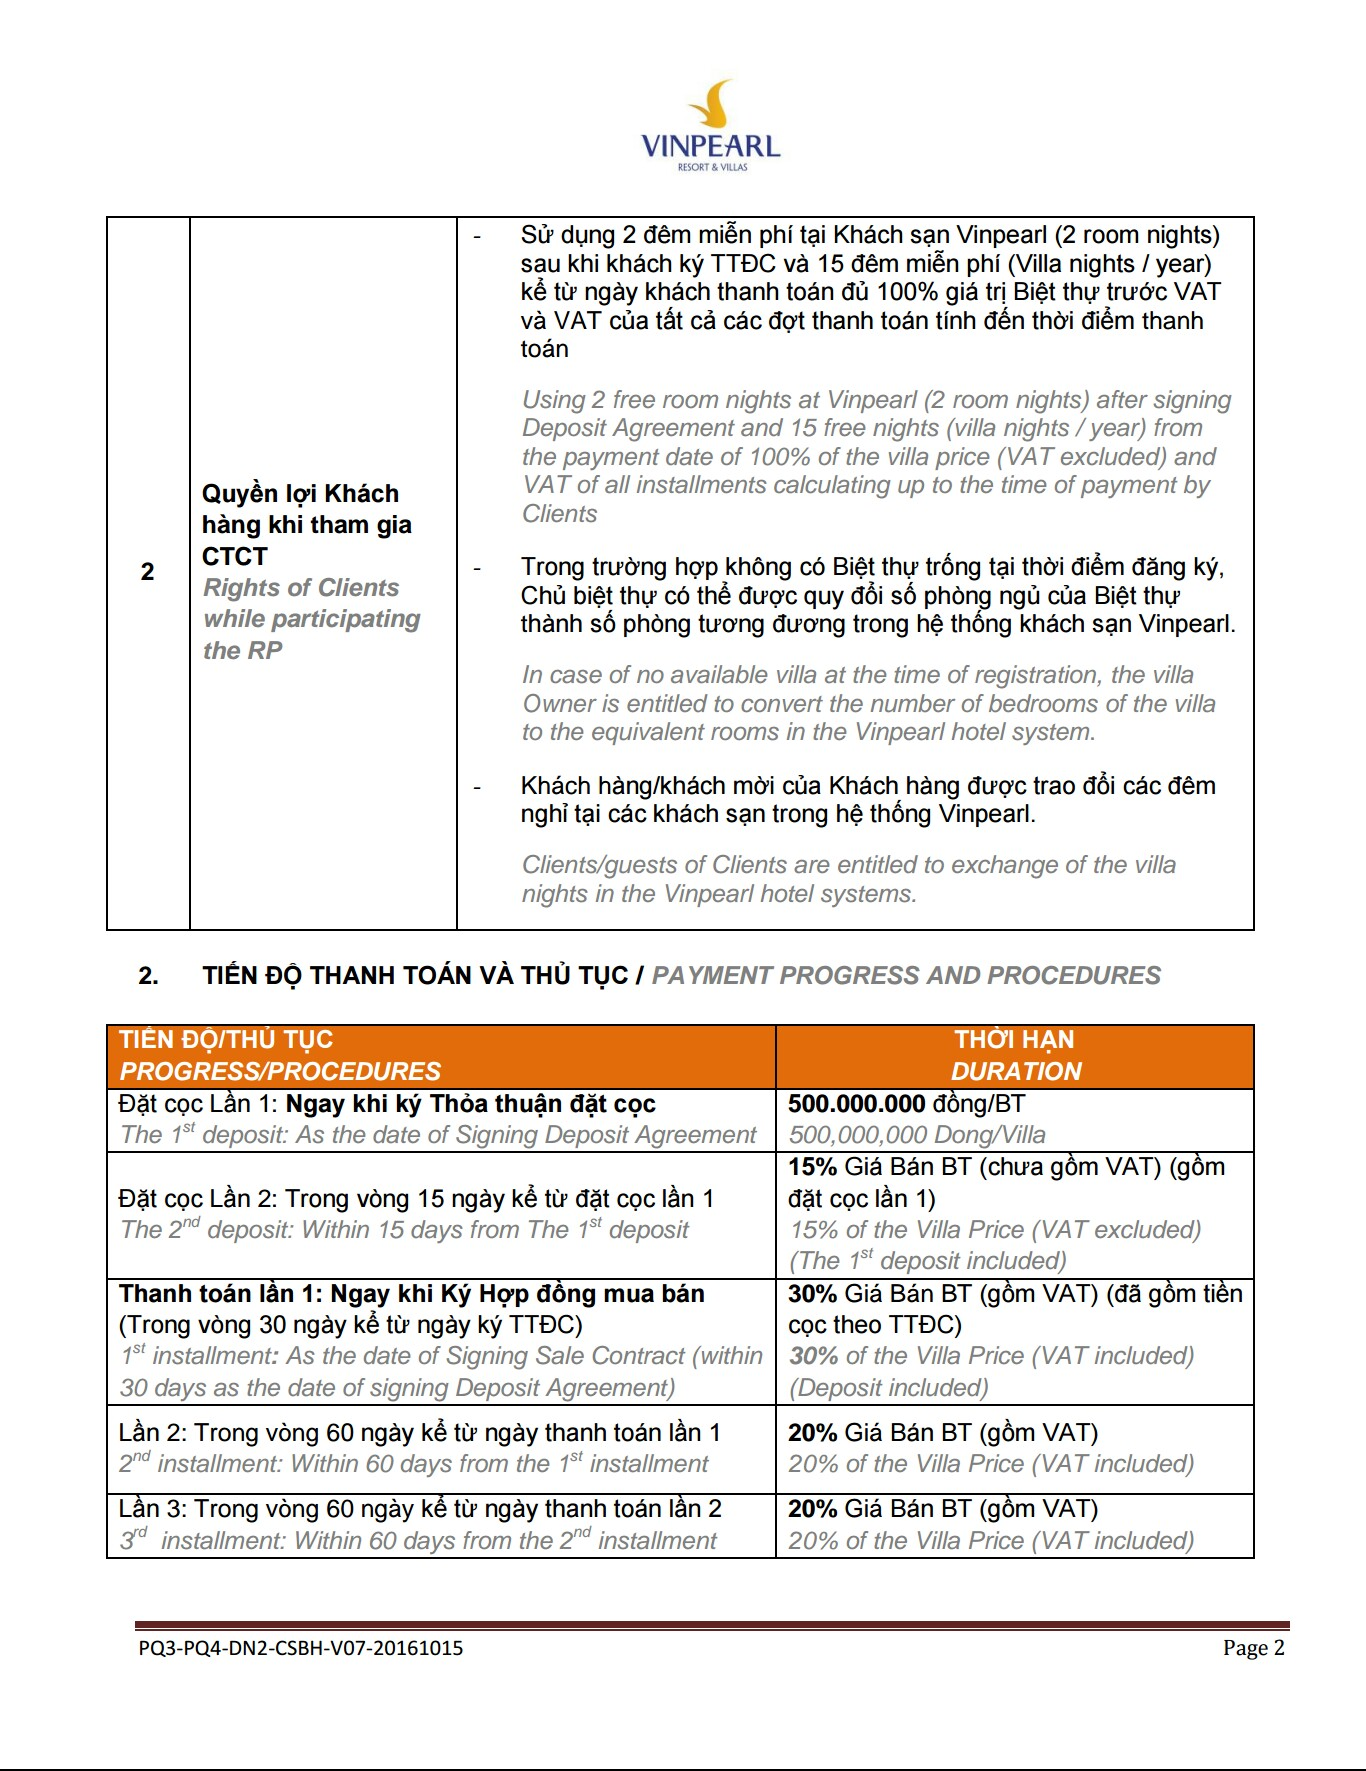 Chinh sach ban hang Vinpearl Phu Quoc